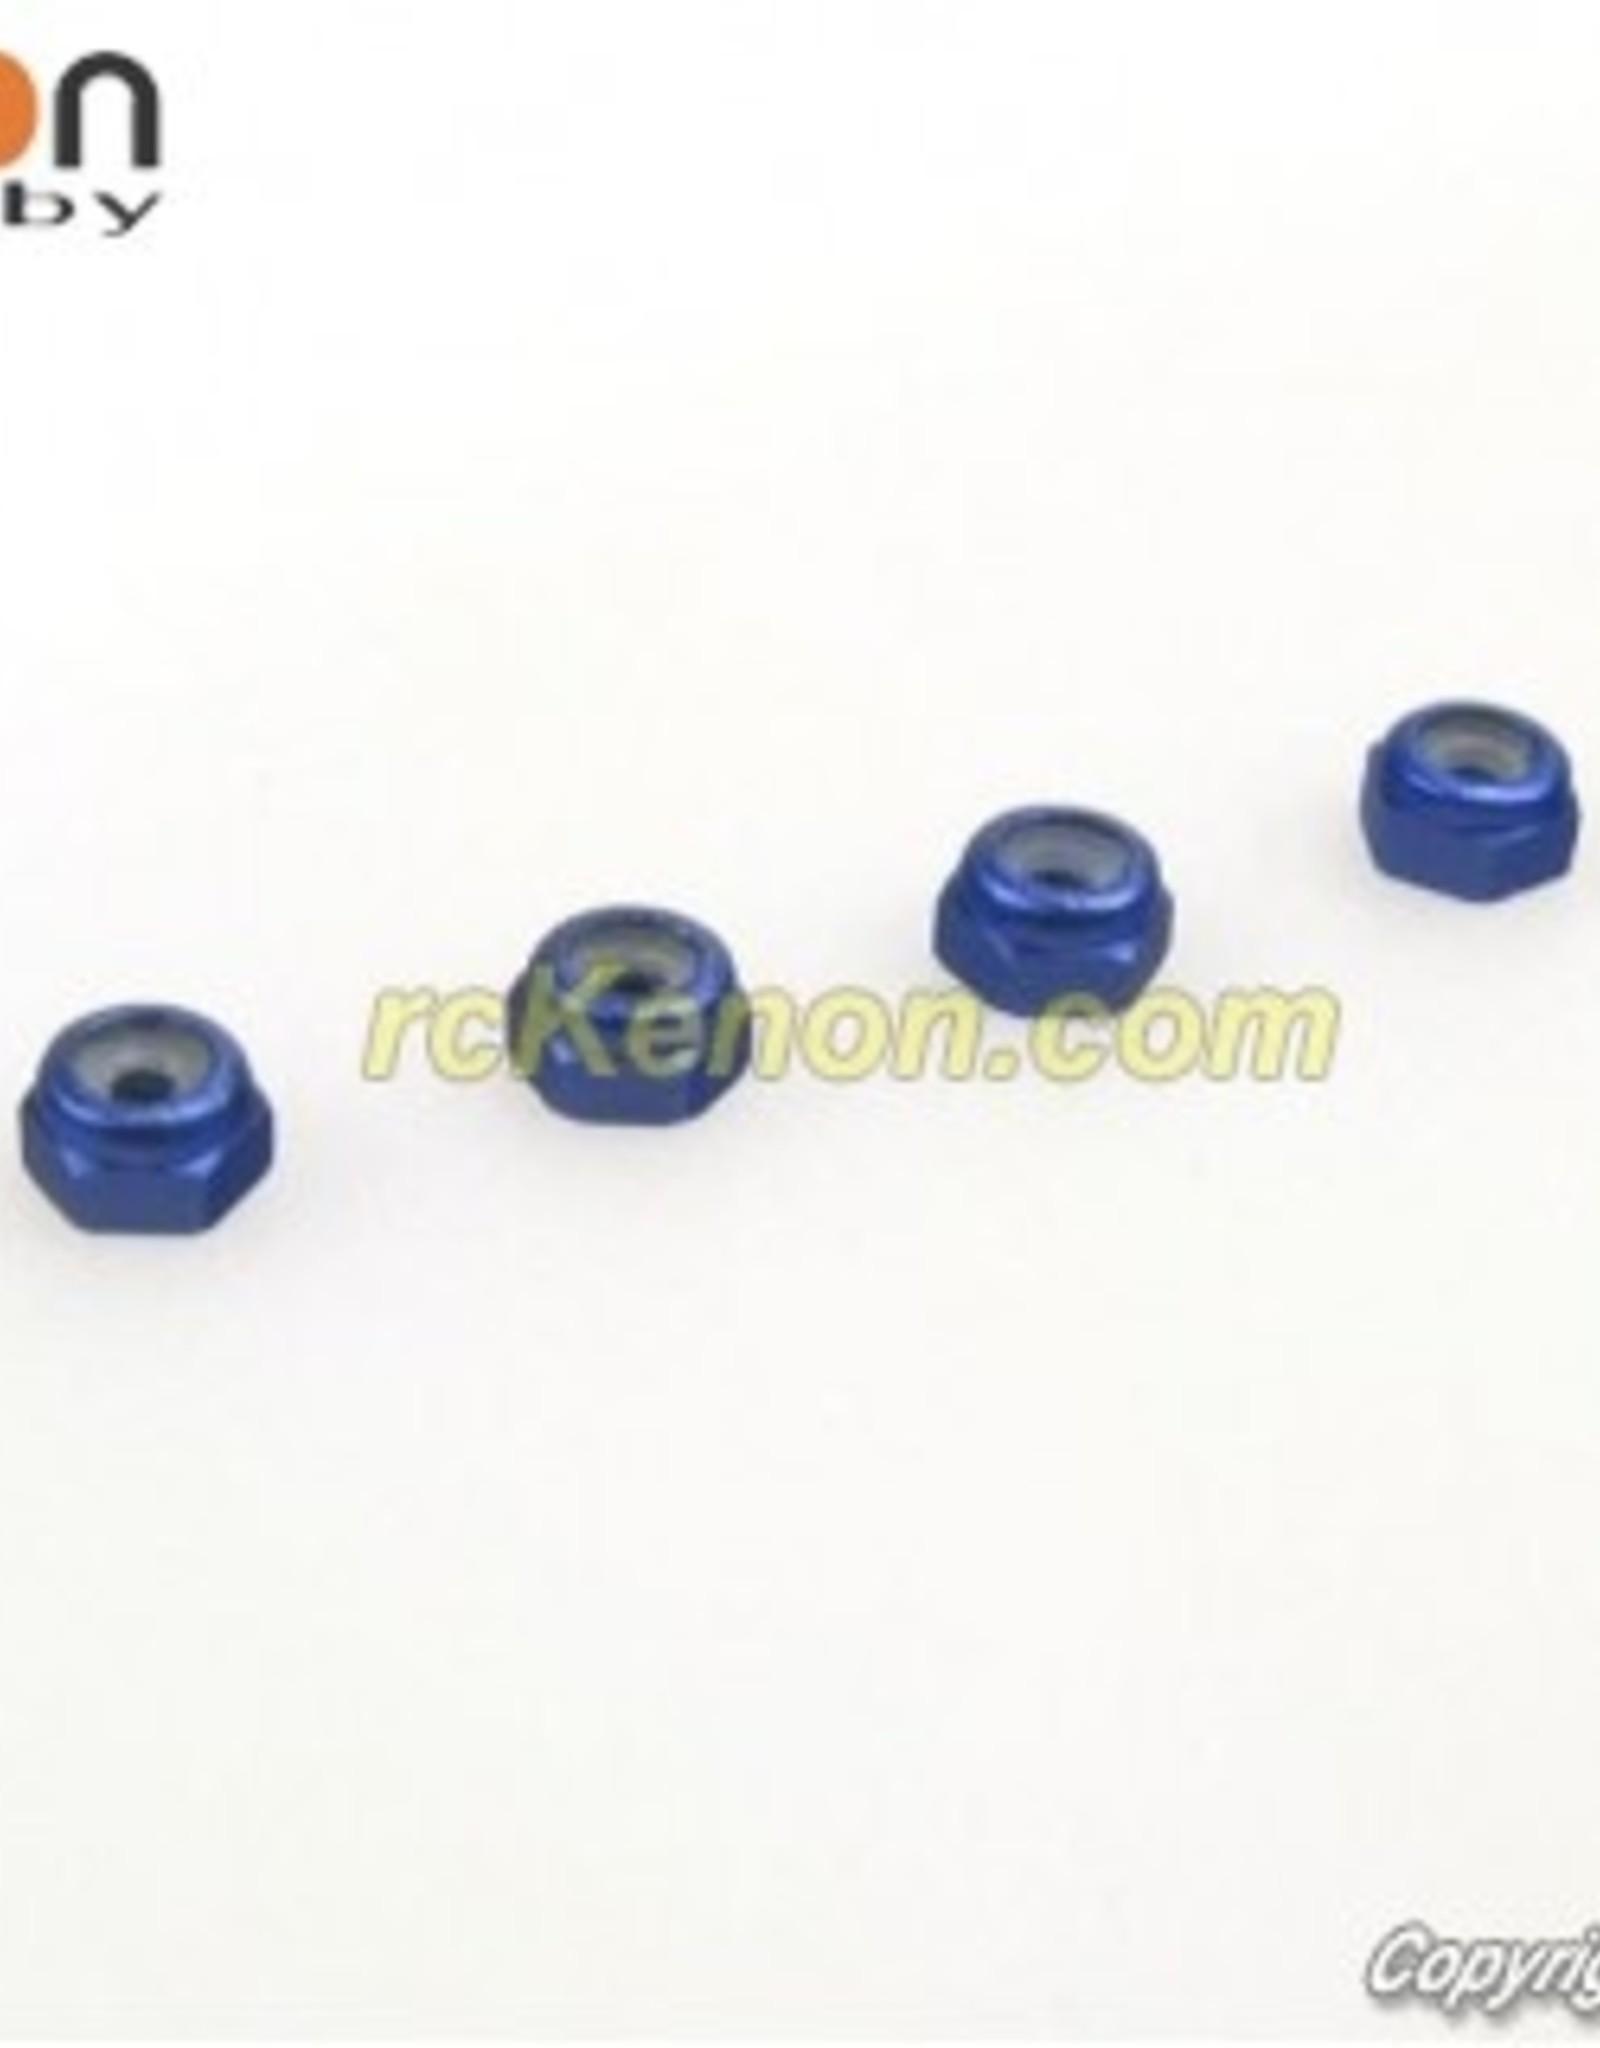 Pn Racing PN Racing Mini-Z Alm. 2mm Wheel Lock Nut - Blue